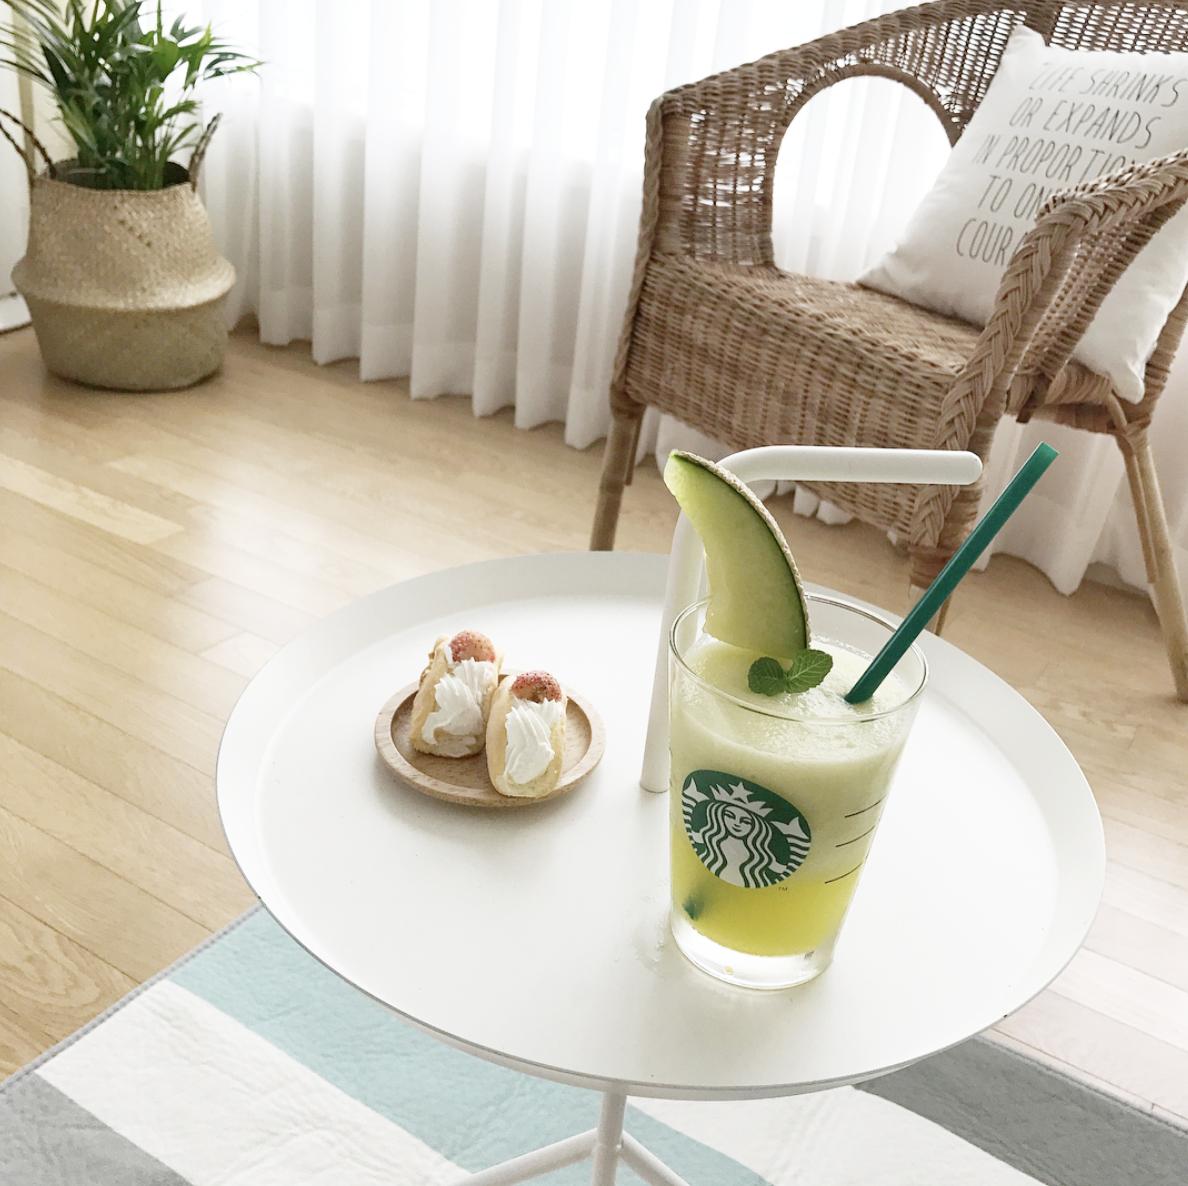 Food   aesthetic   Rooms   Melon joy on We Heart It